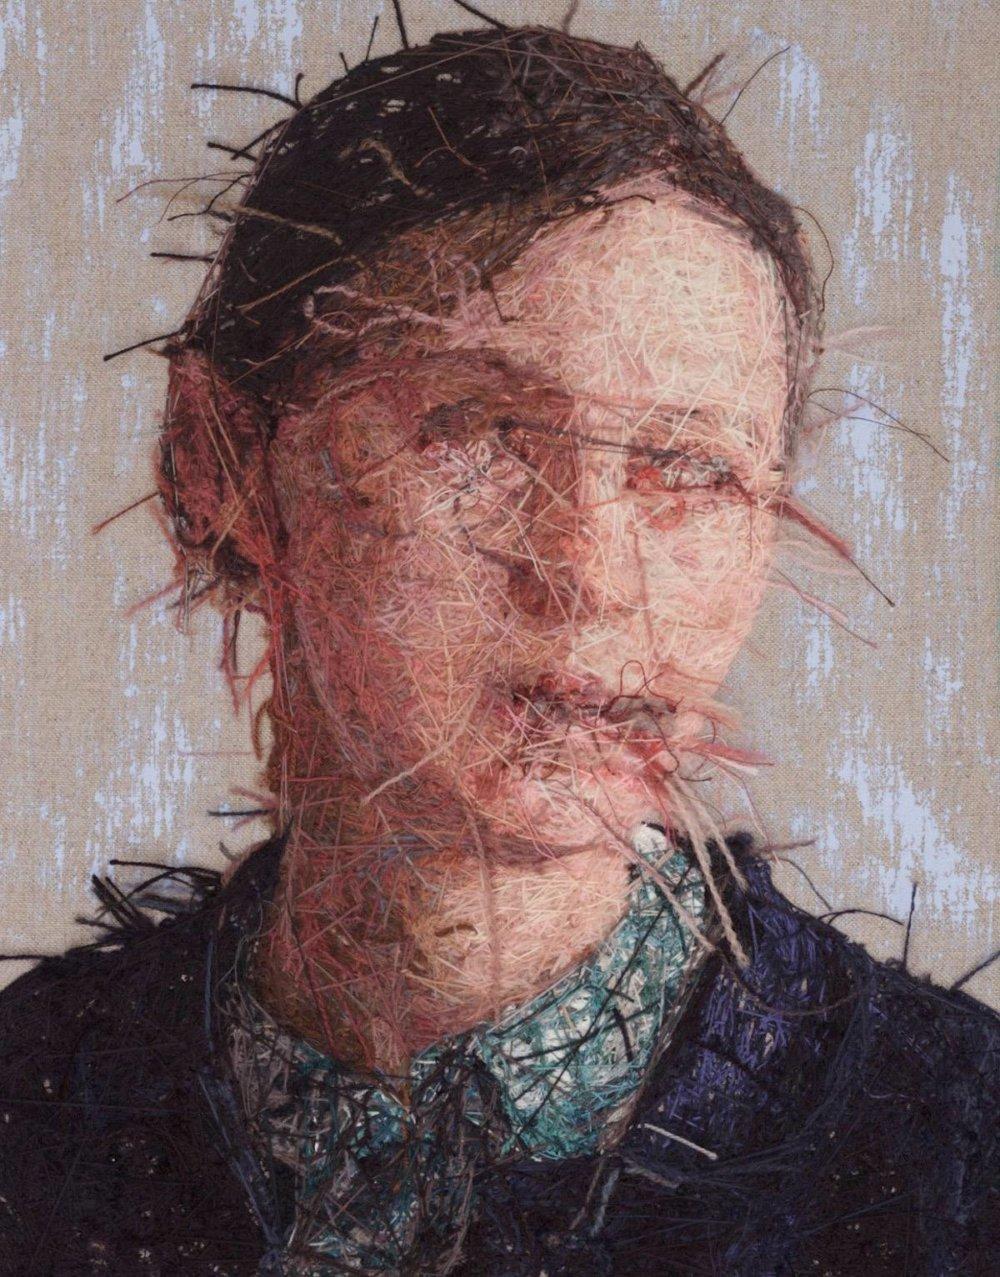 Realistic Embroidered Portraits By American Artist Cayce Zavaglia 2